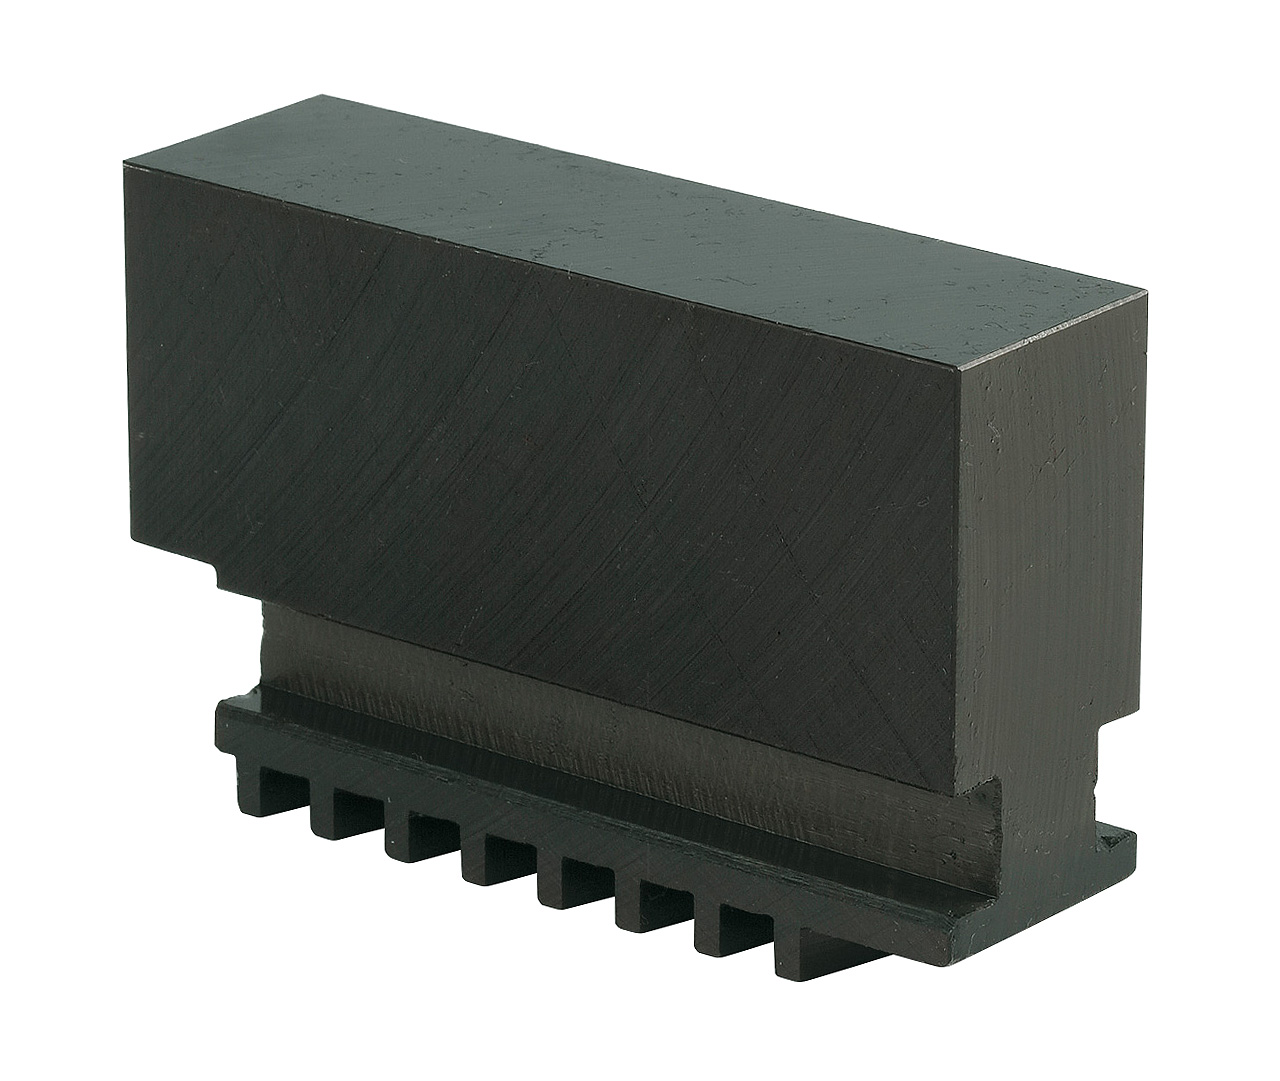 Szczęki jednolite miękkie - komplet DSJ-DK11-200 BERNARDO